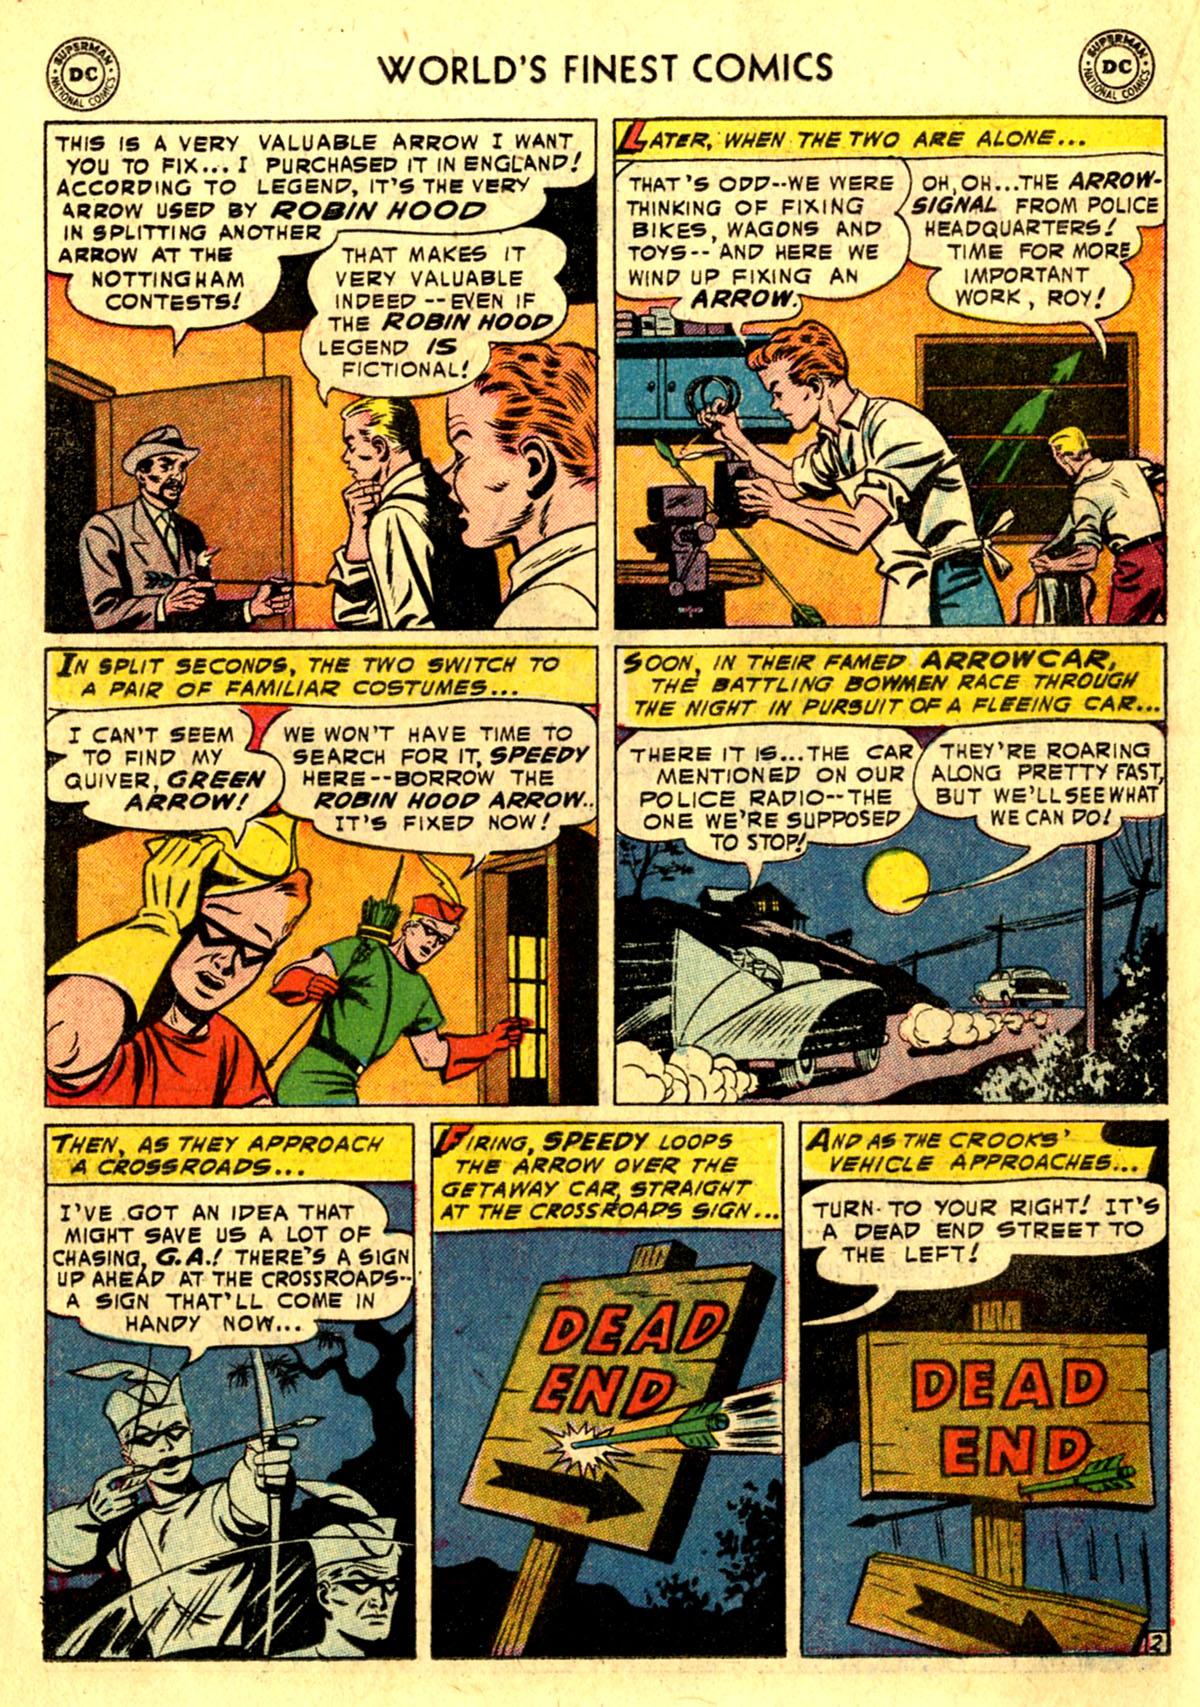 Read online World's Finest Comics comic -  Issue #75 - 18